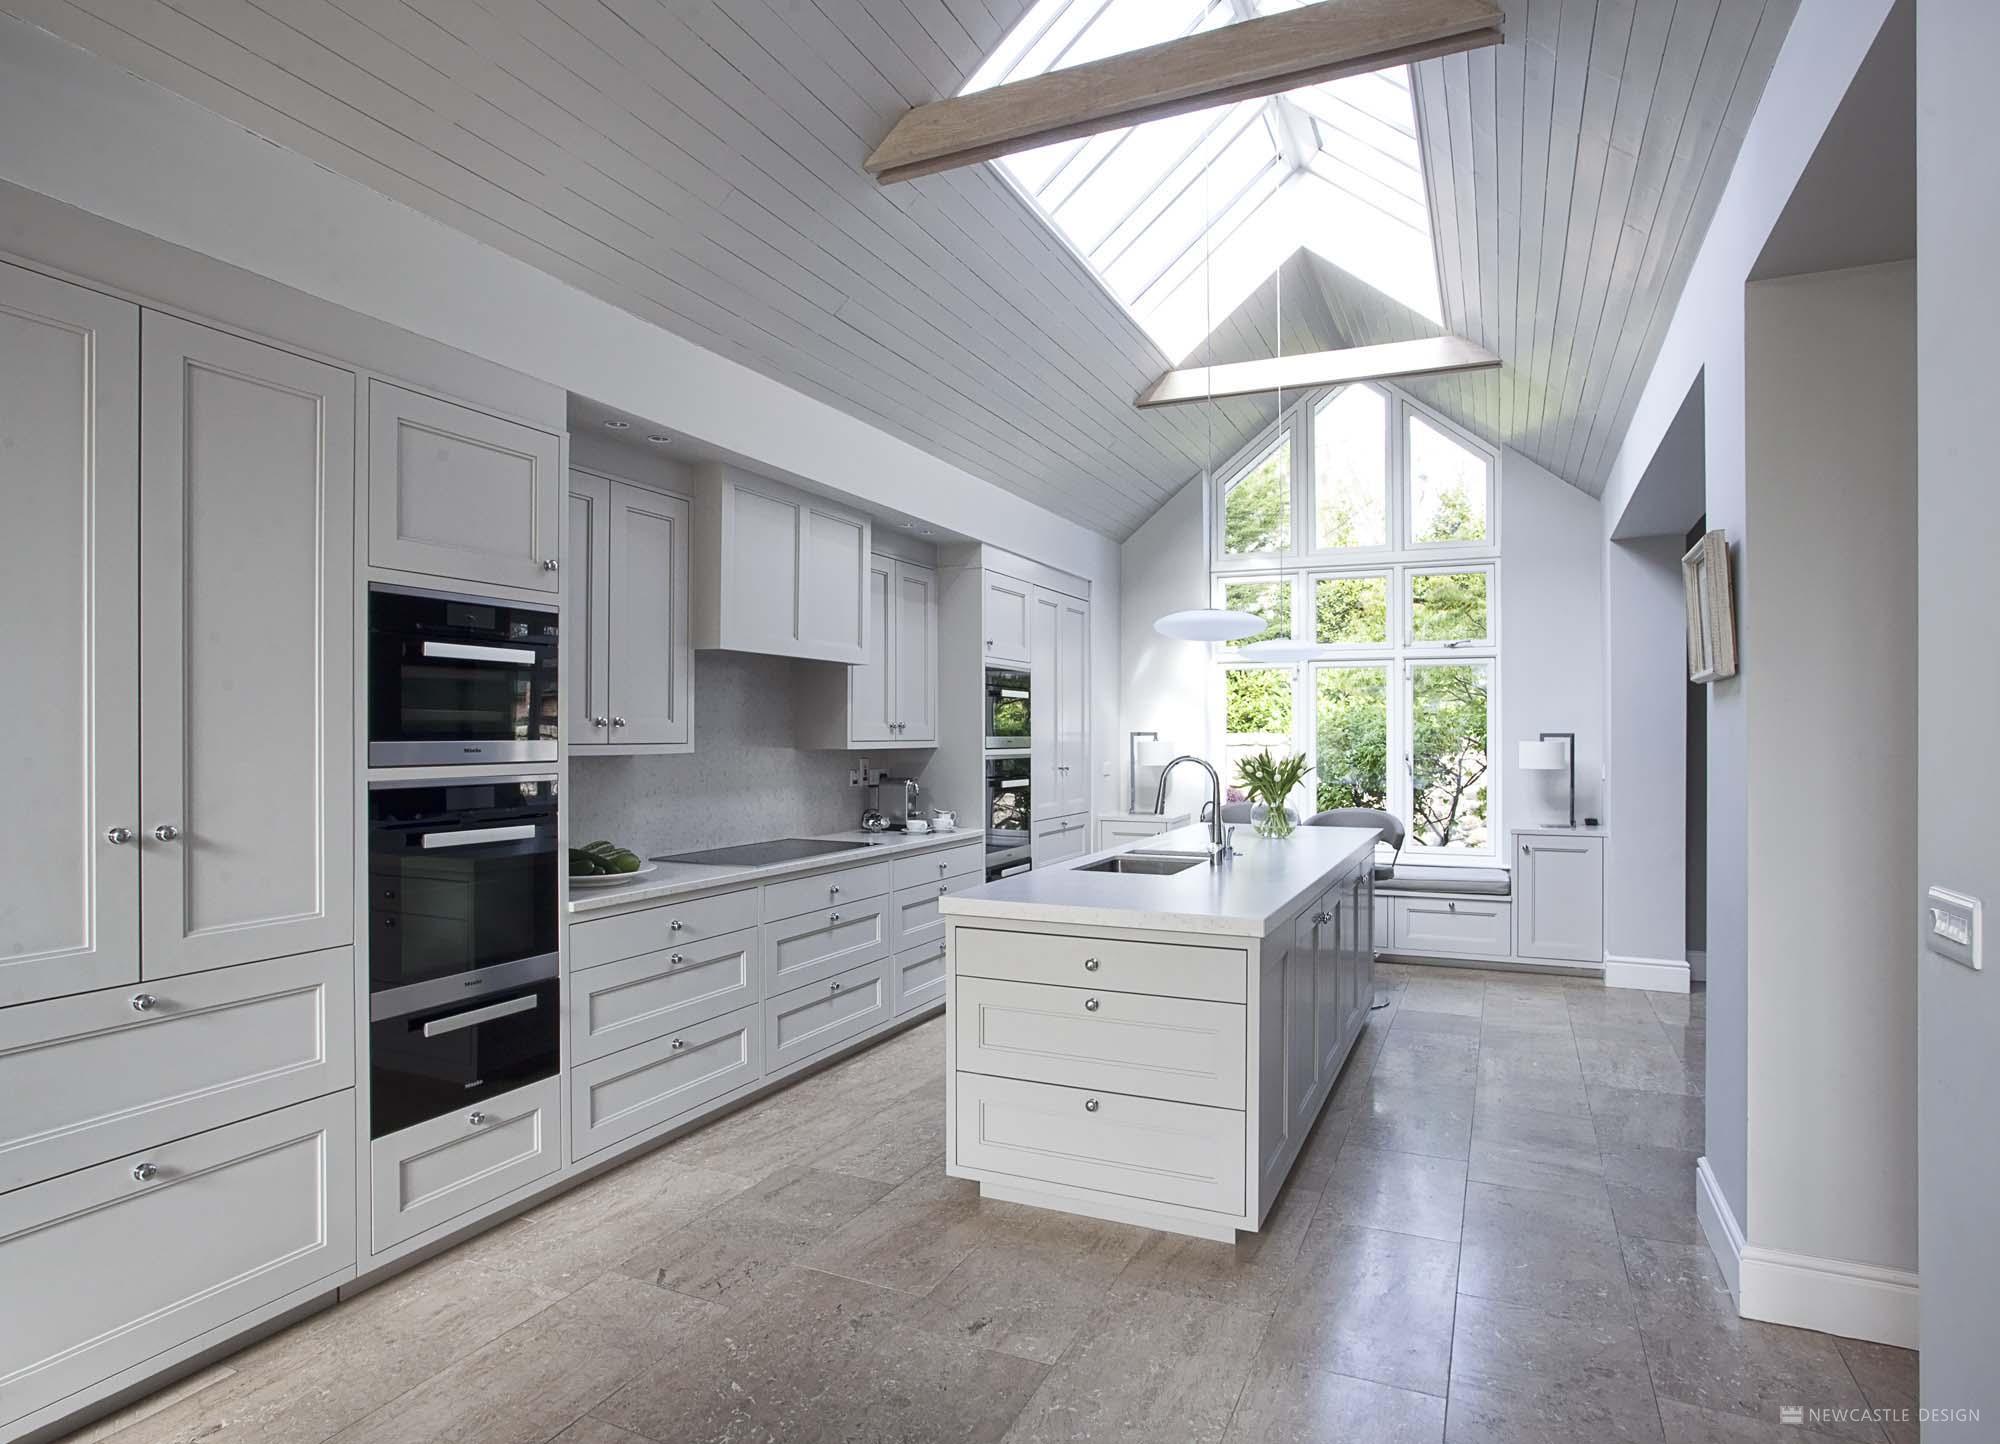 Newcastle Kitchen Company. Aeg Cookery Newcastle Kitchen U Bedroom ...